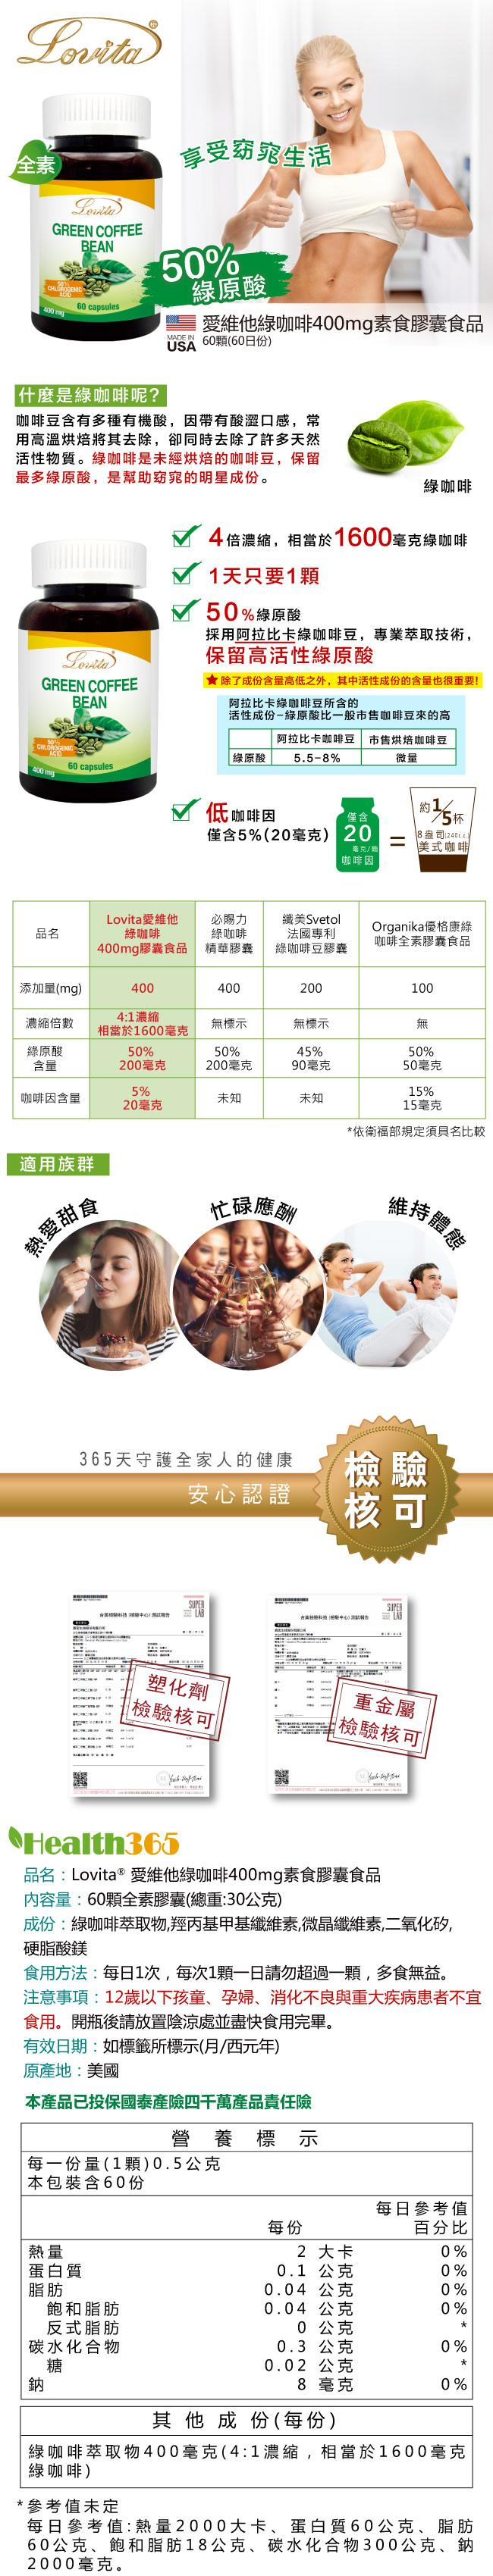 Lovita愛維他-高單位綠咖啡400mg素食膠囊食品(60粒-60天份)產品資訊